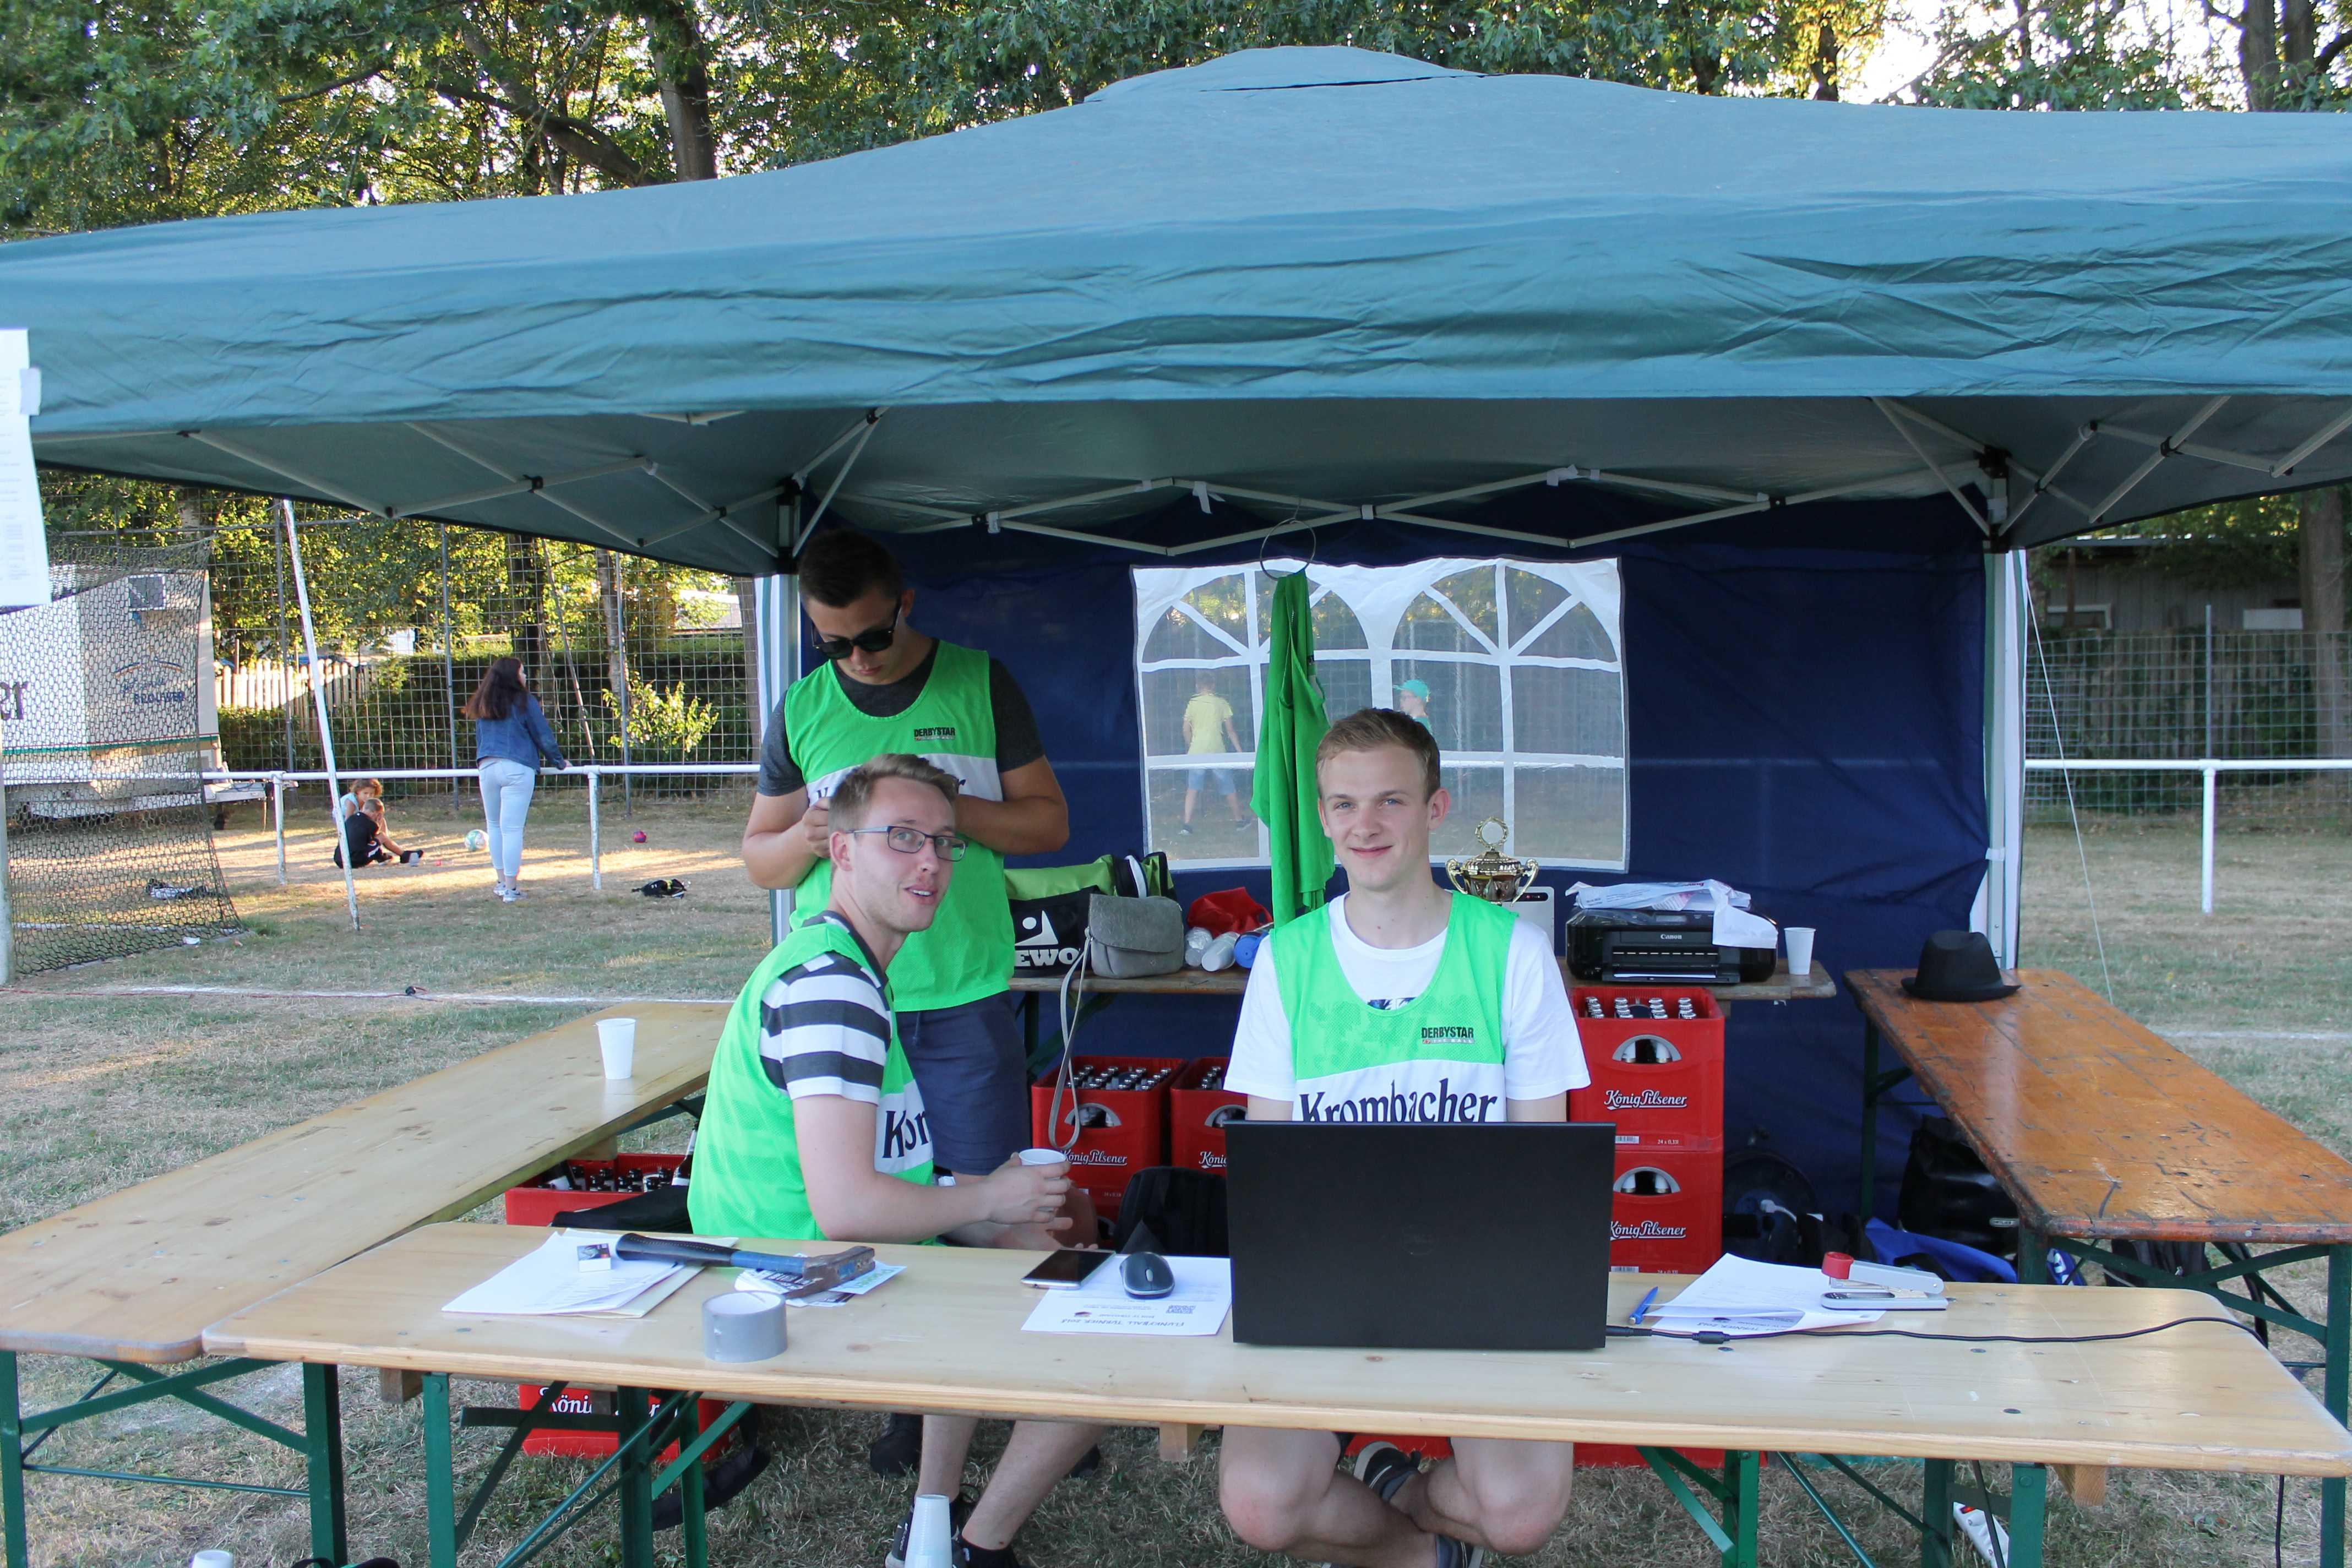 2018-07-27 Sportwoche - Flunkyball Turnier (46)